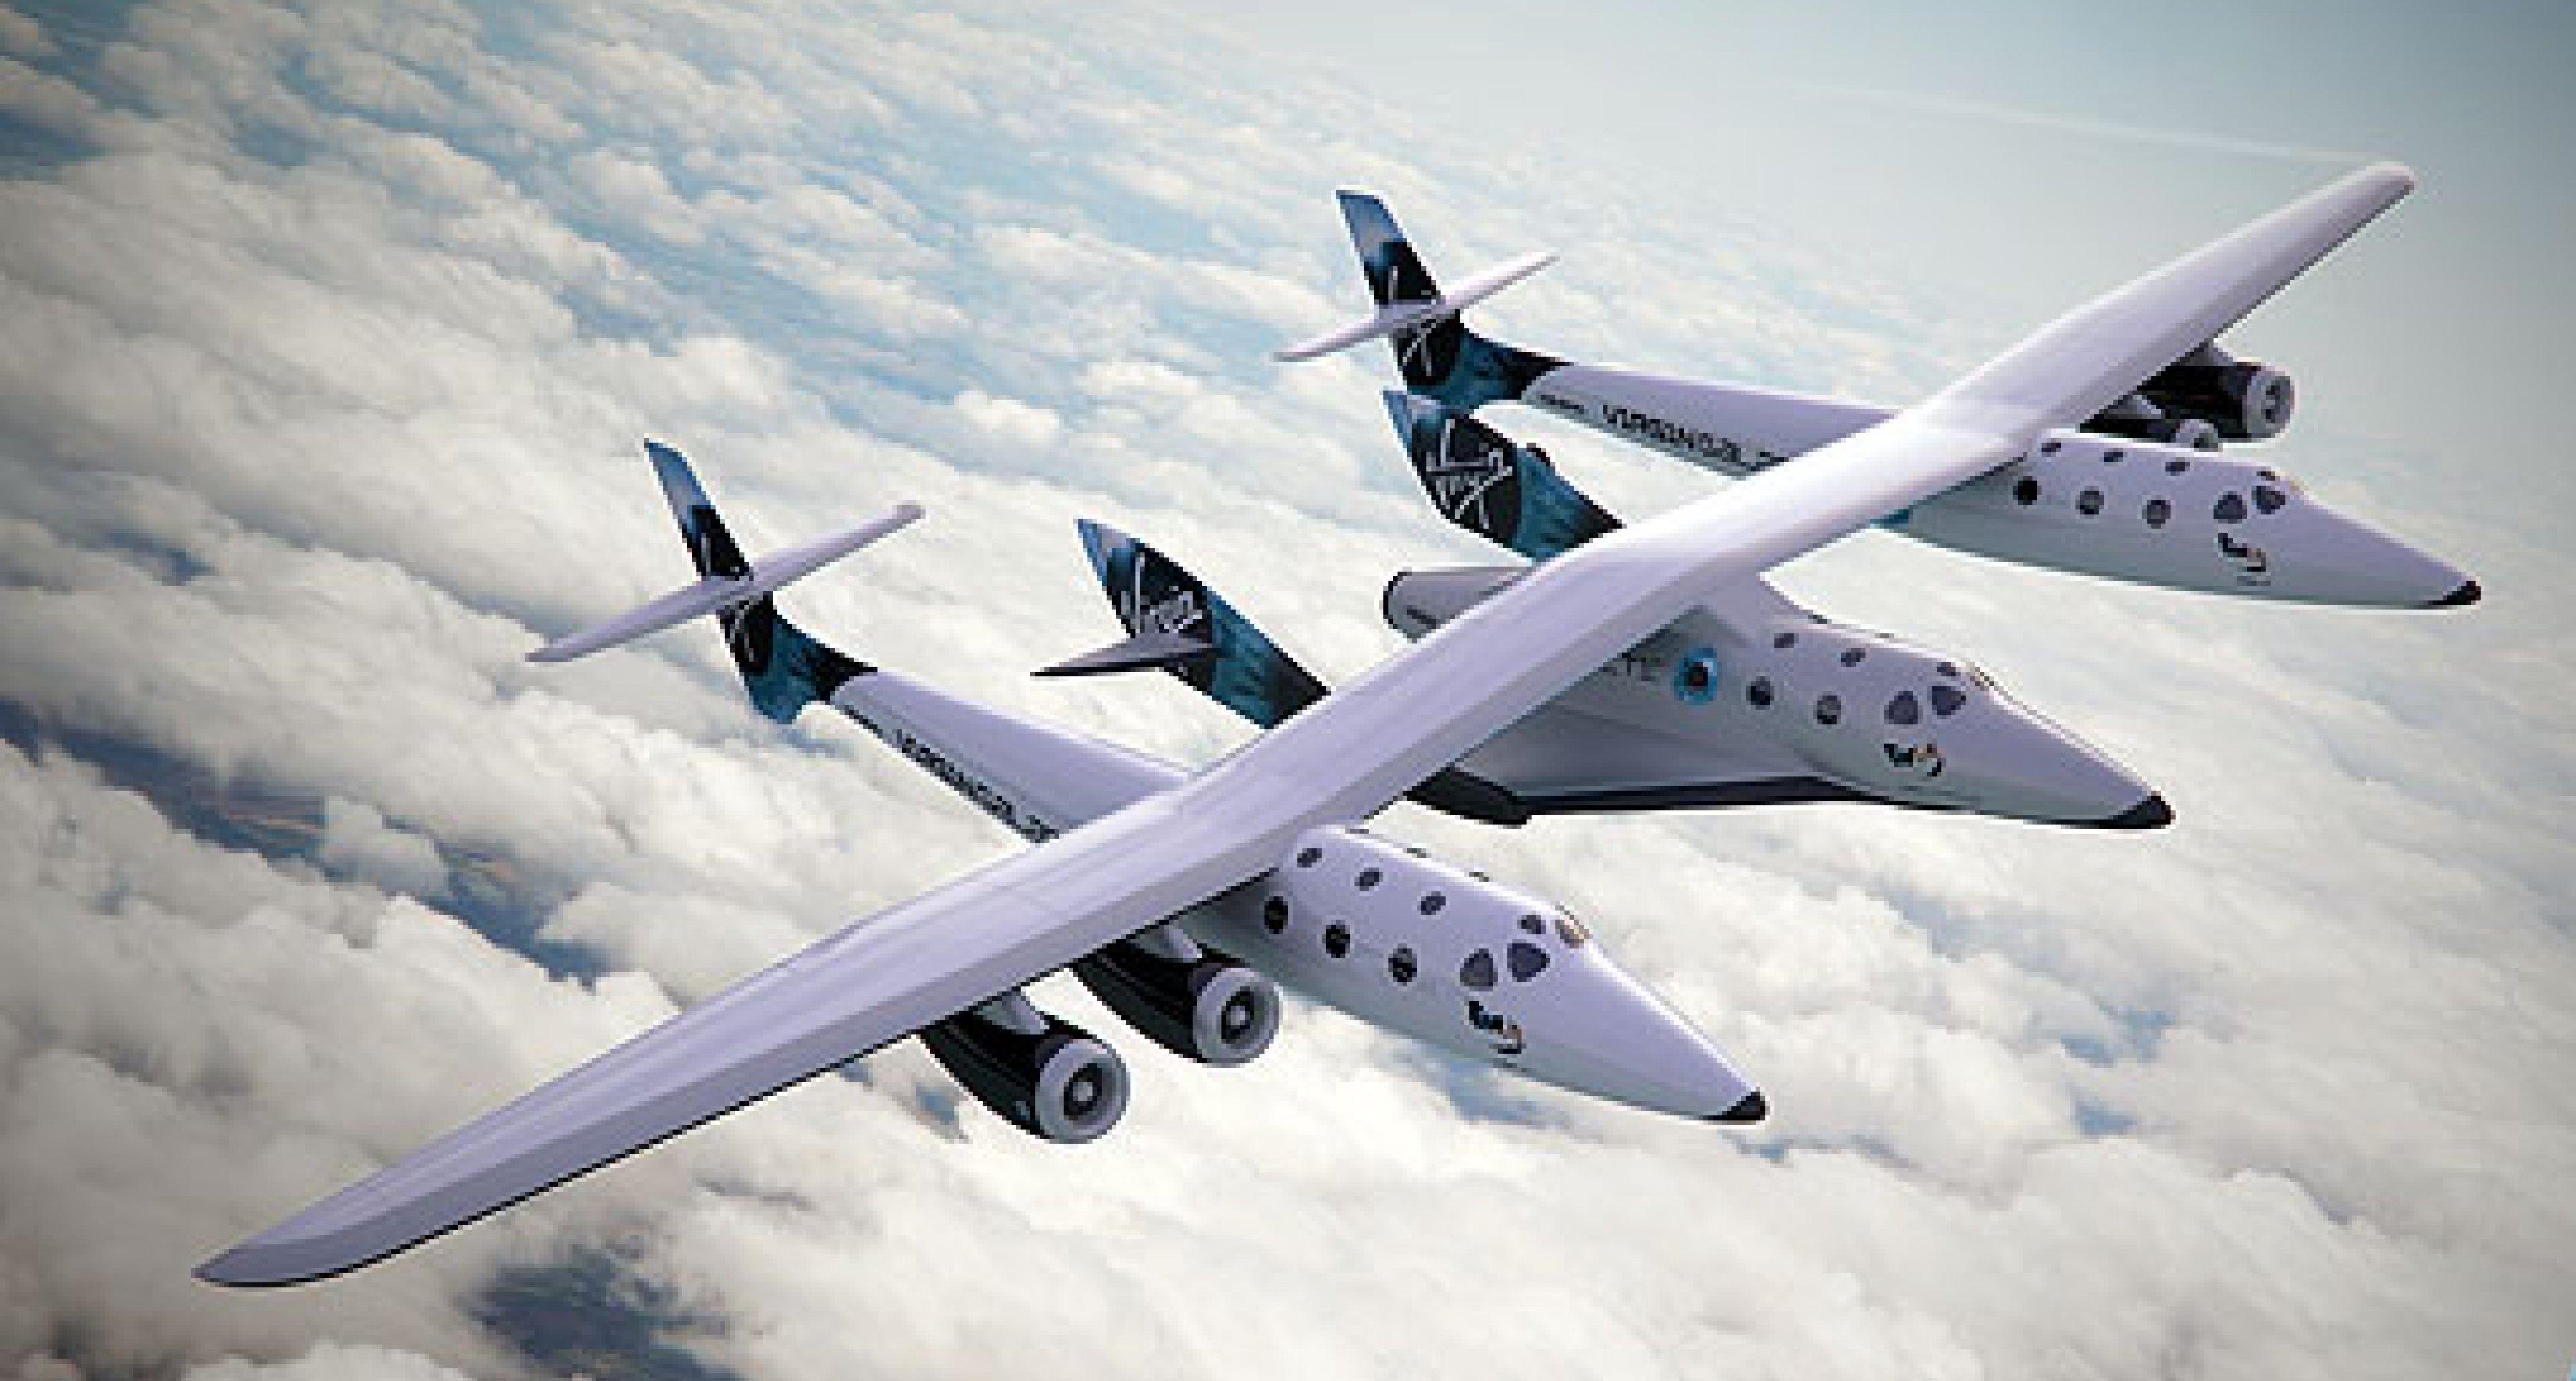 Virgin Galactic: Year of the Spaceship